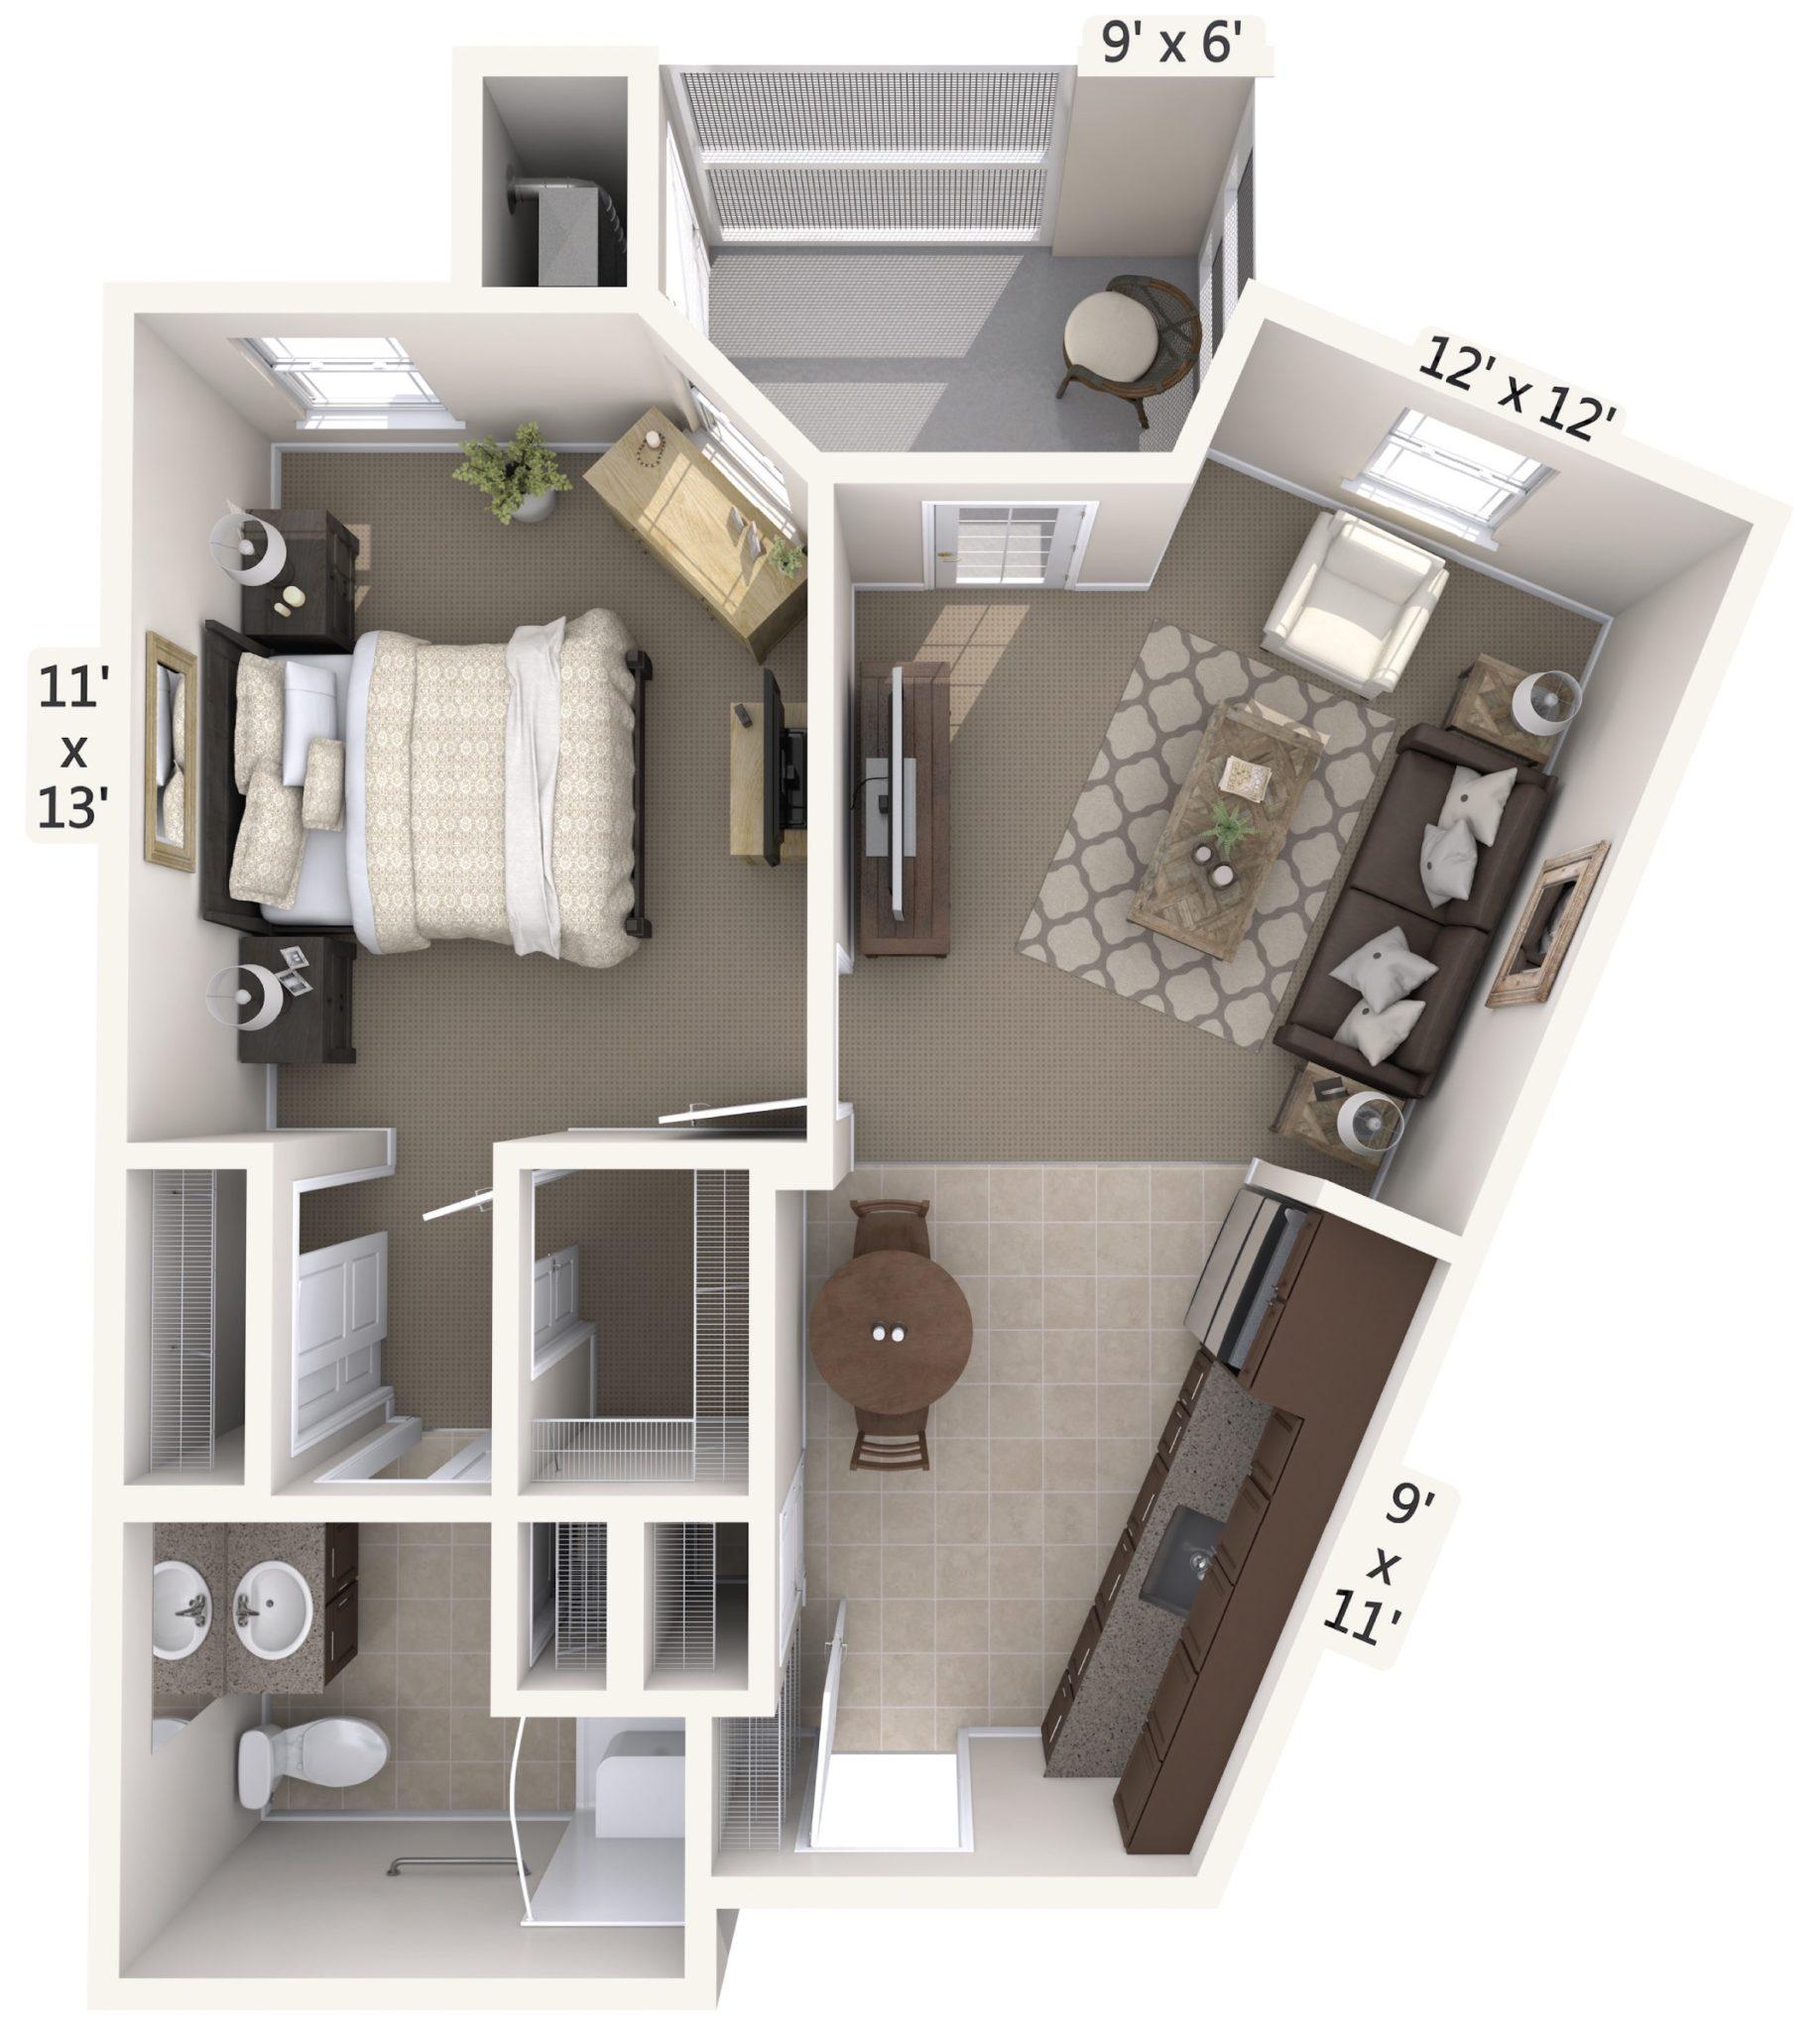 AddingtonPlace_One-Bedroom-Tempo_599-sq.-ft._AL_Stuart-1835x2048